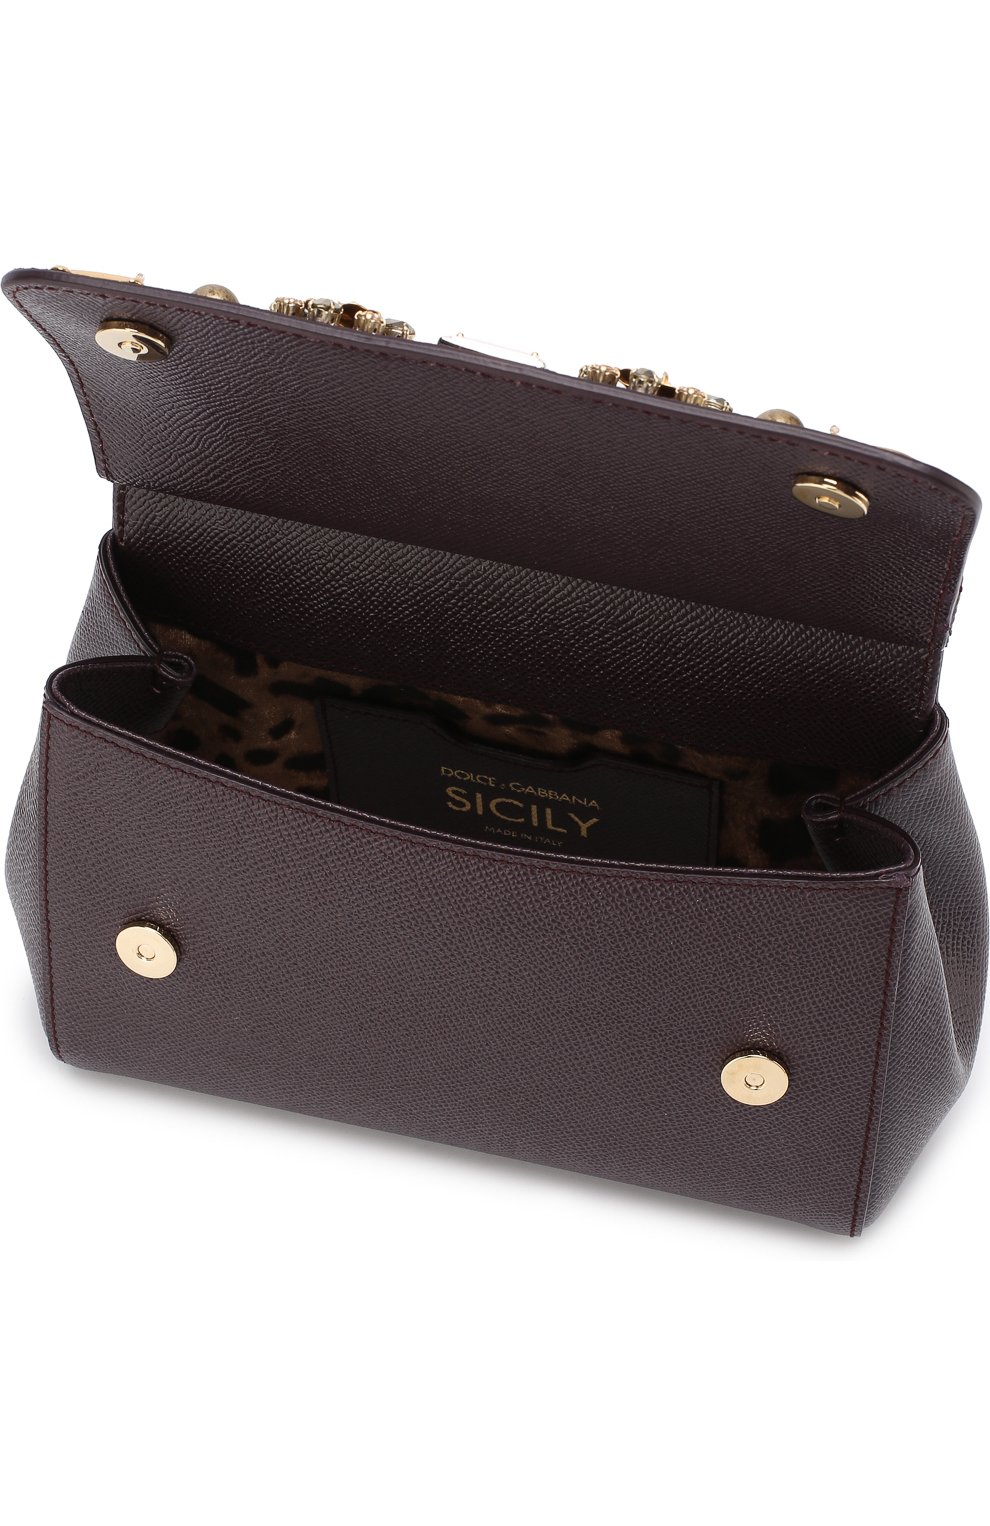 Женская сумка sicily small с аппликациями DOLCE & GABBANA бордового цвета, арт. BB6003/B5230 | Фото 4